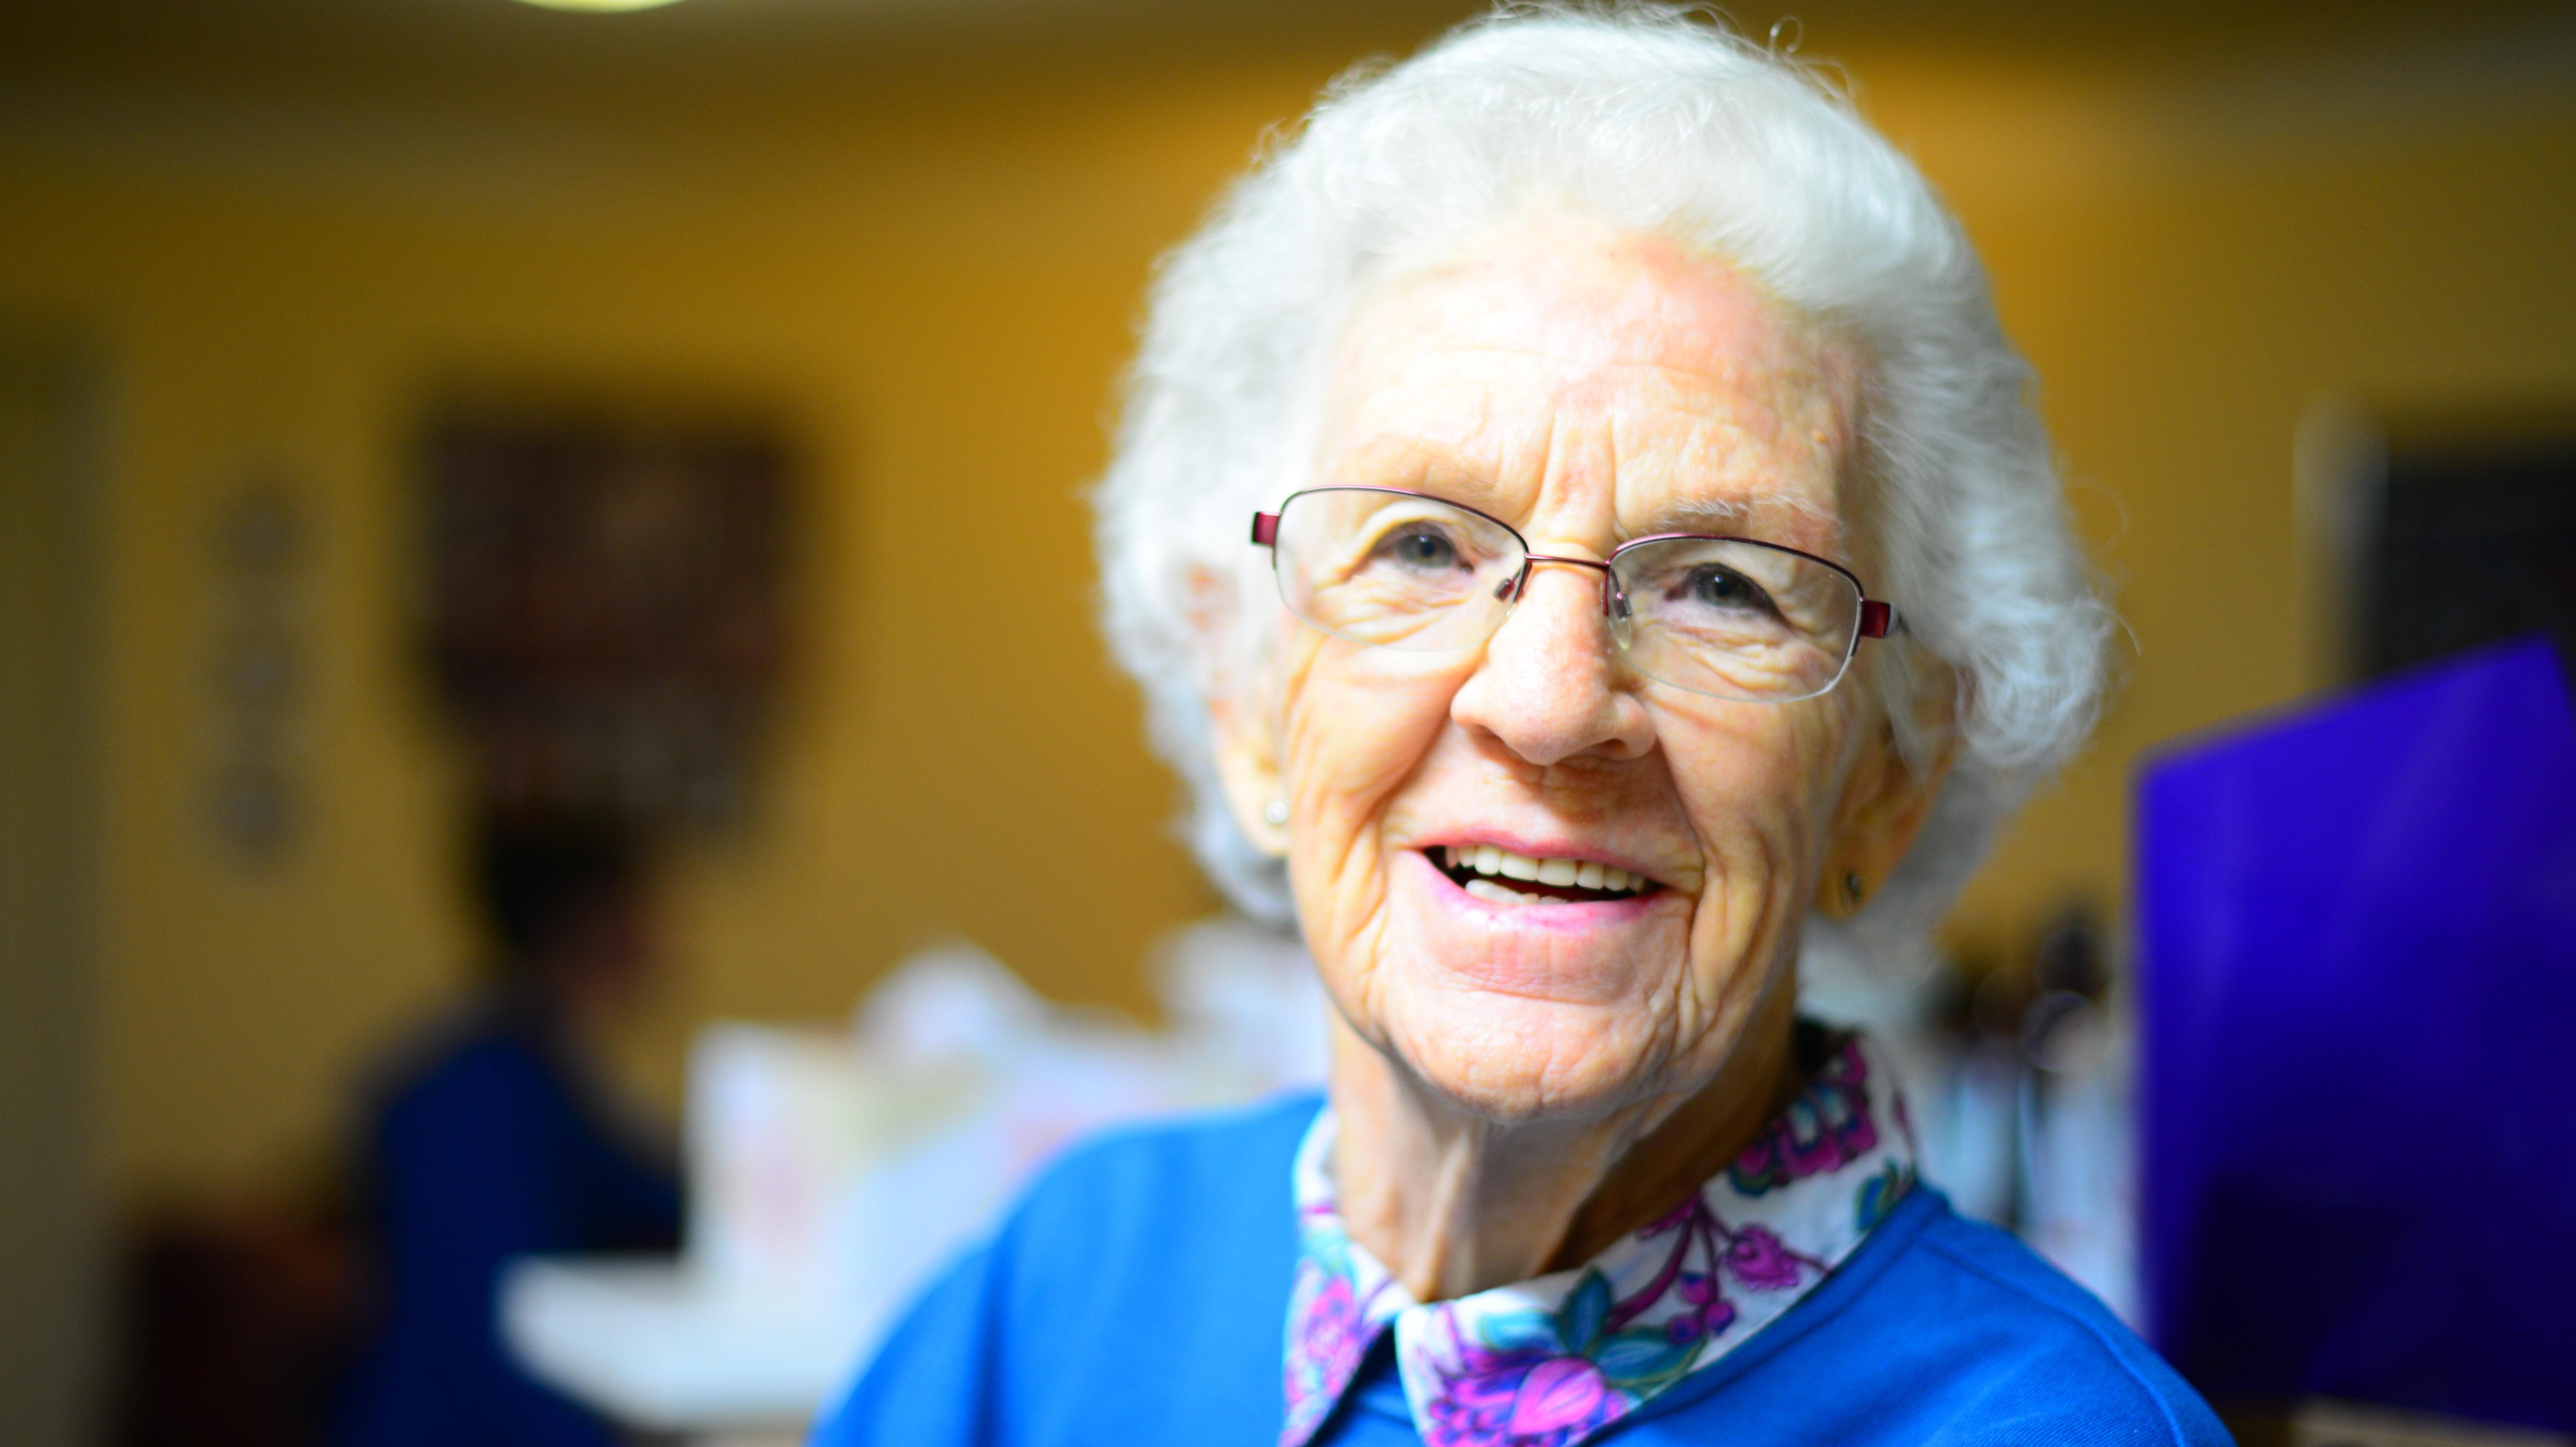 0108421_adult-elder-elderly-432722pexelscom300dpi